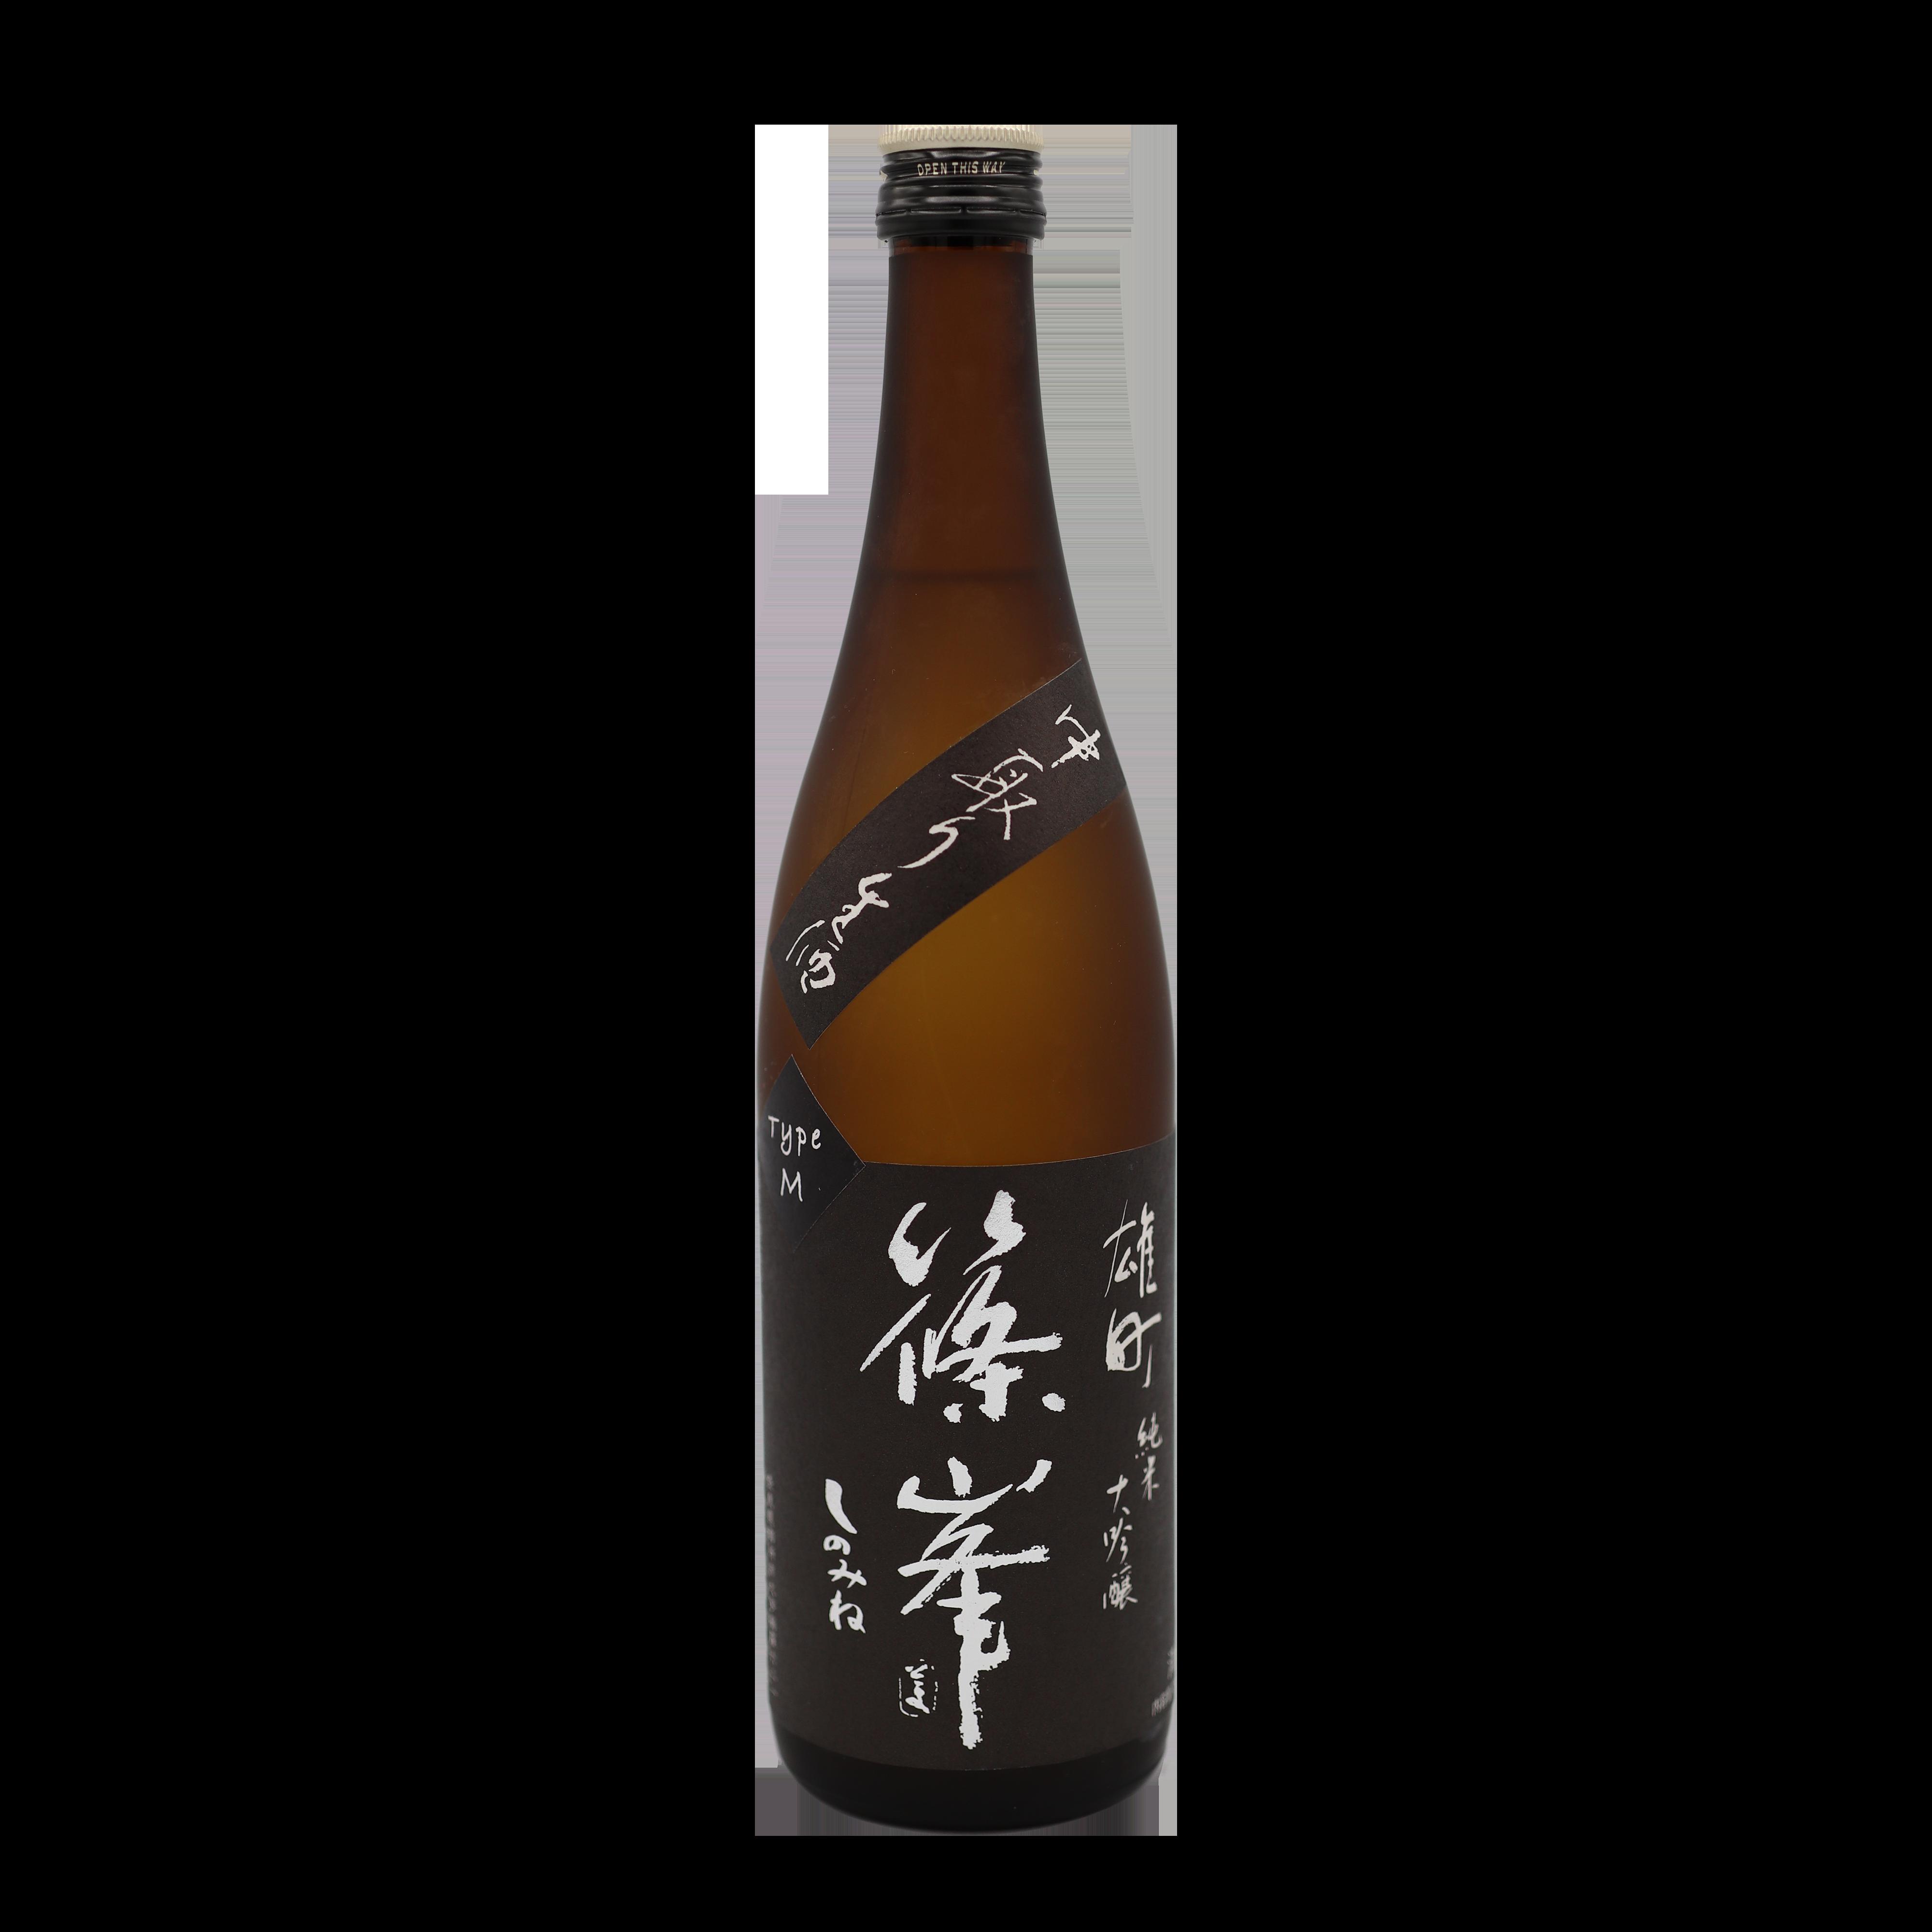 Shinomine Omachi Junmai Daiginjo